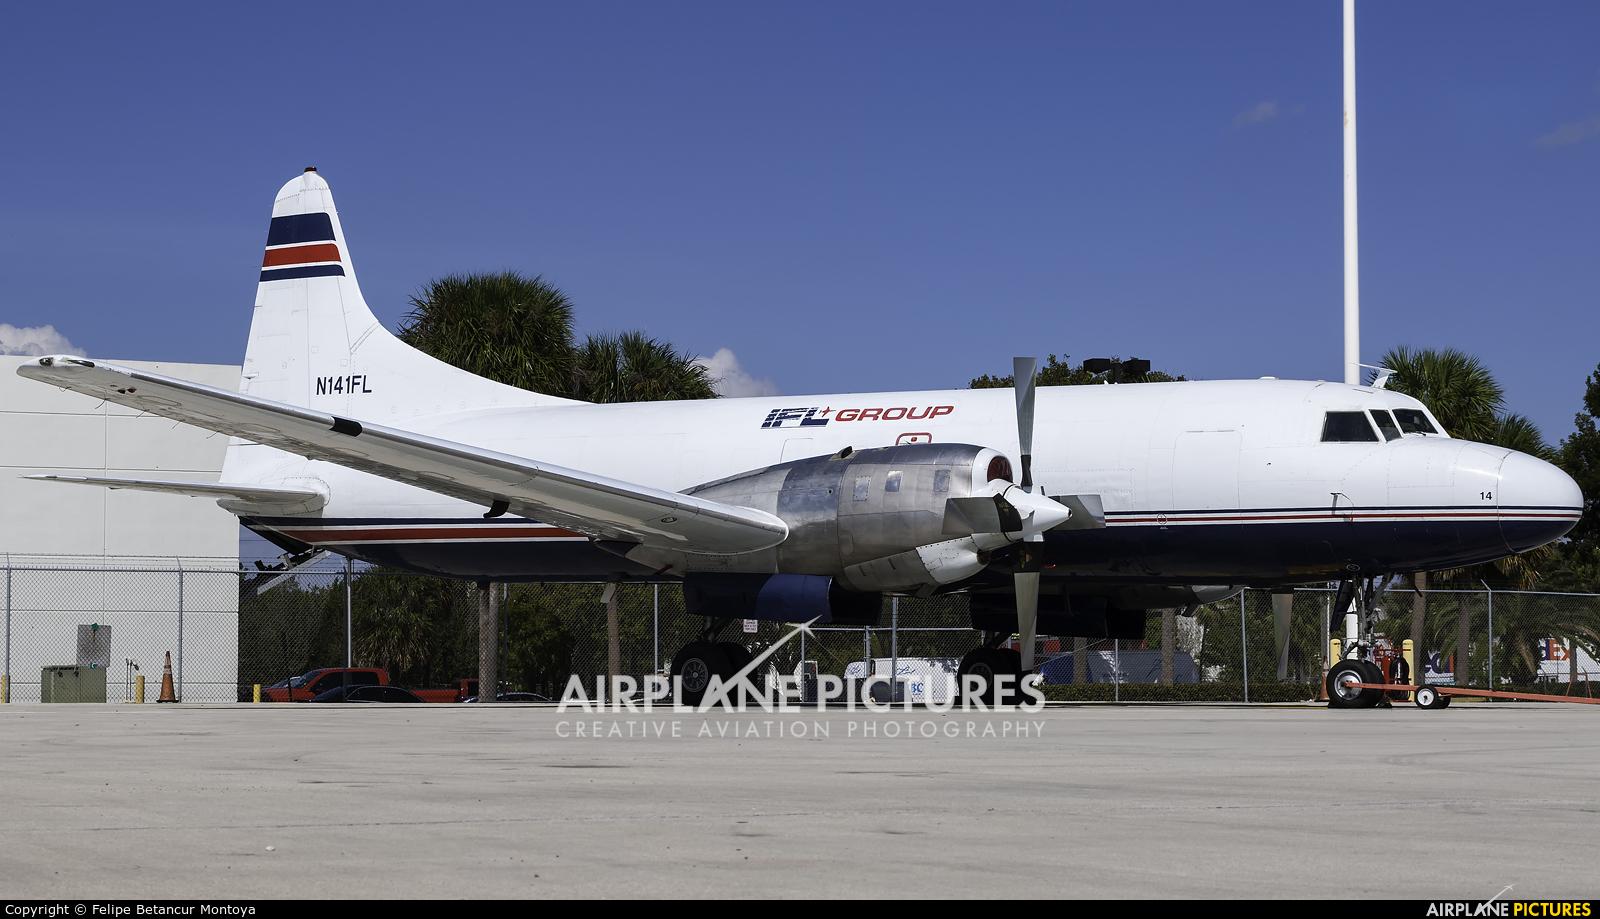 Gulf & Caribbean Cargo (IFL Group) N141FL aircraft at Miami Intl